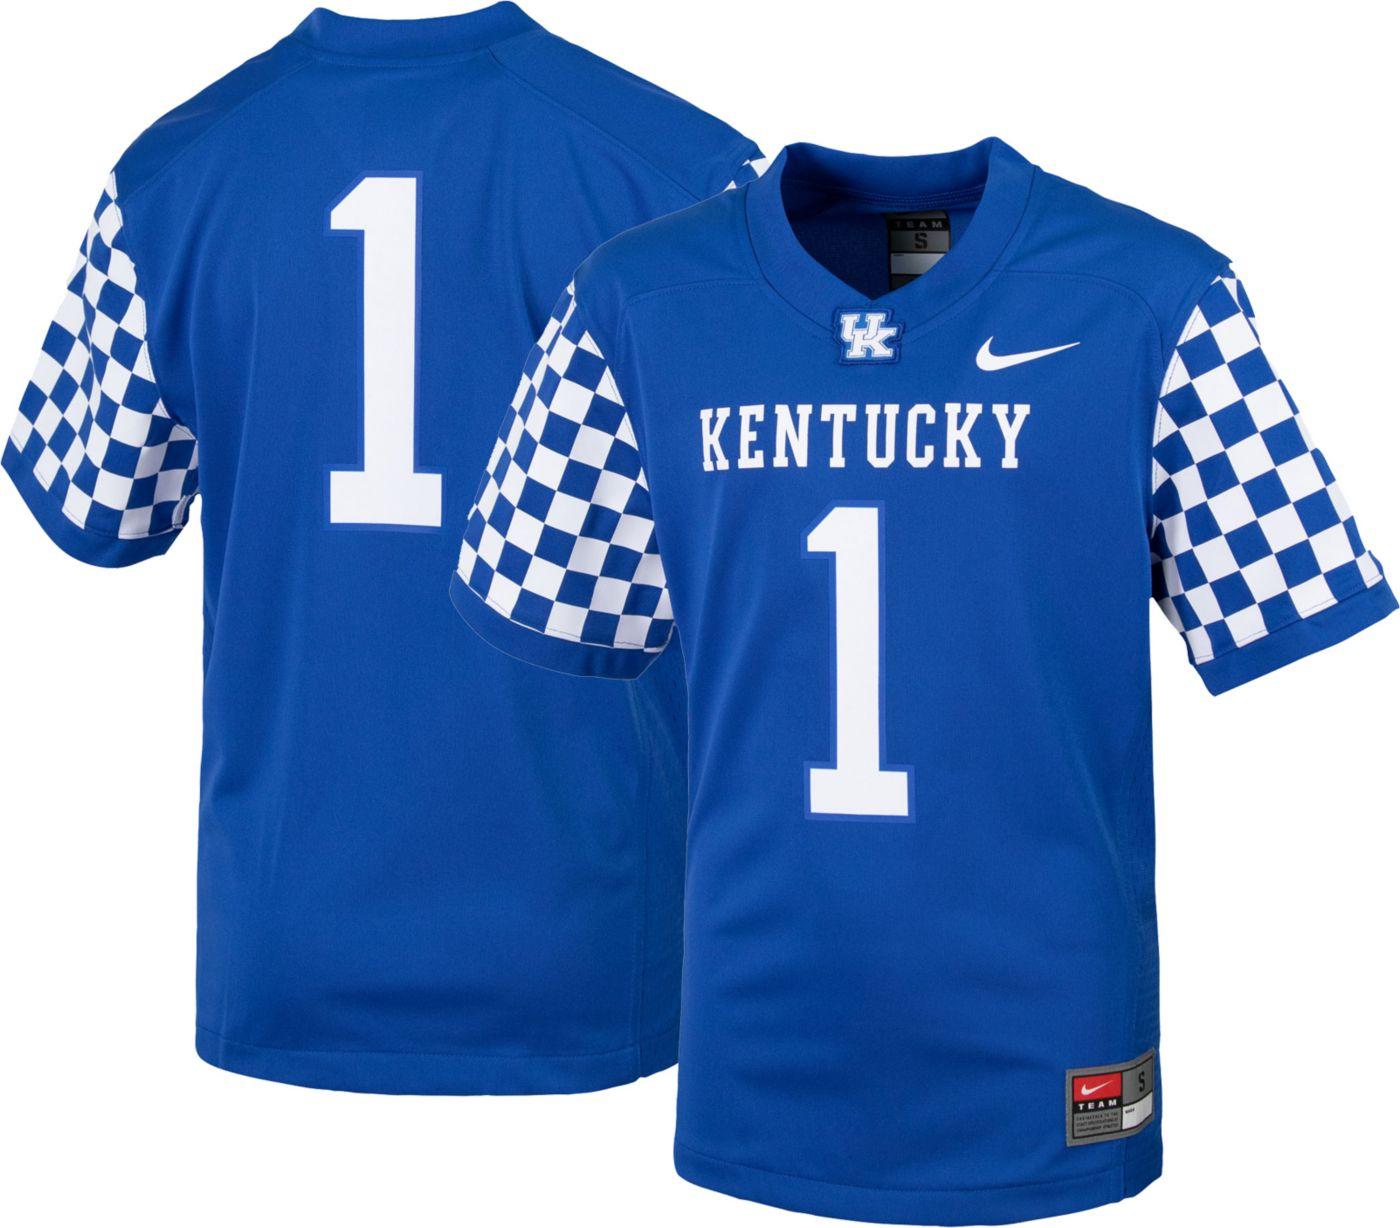 Nike Youth Kentucky Wildcats #1 Blue Replica Football Jersey